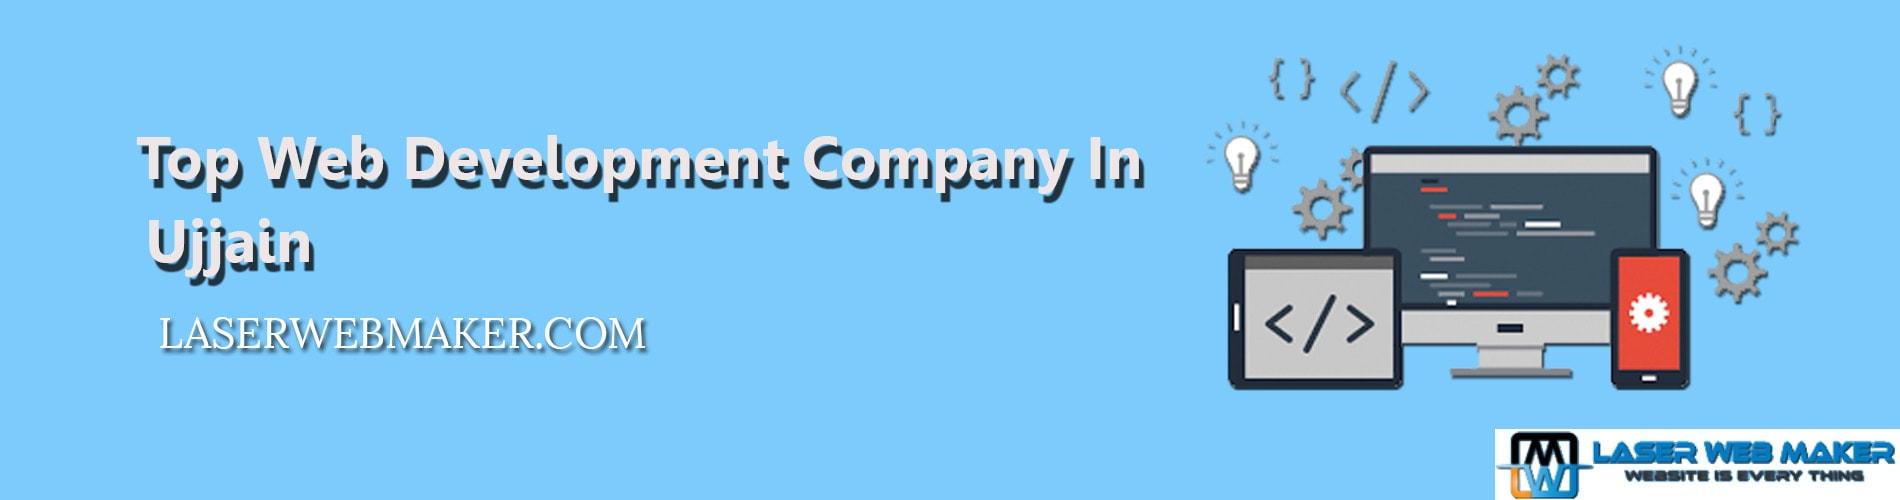 Top Web Development Company In Ujjain